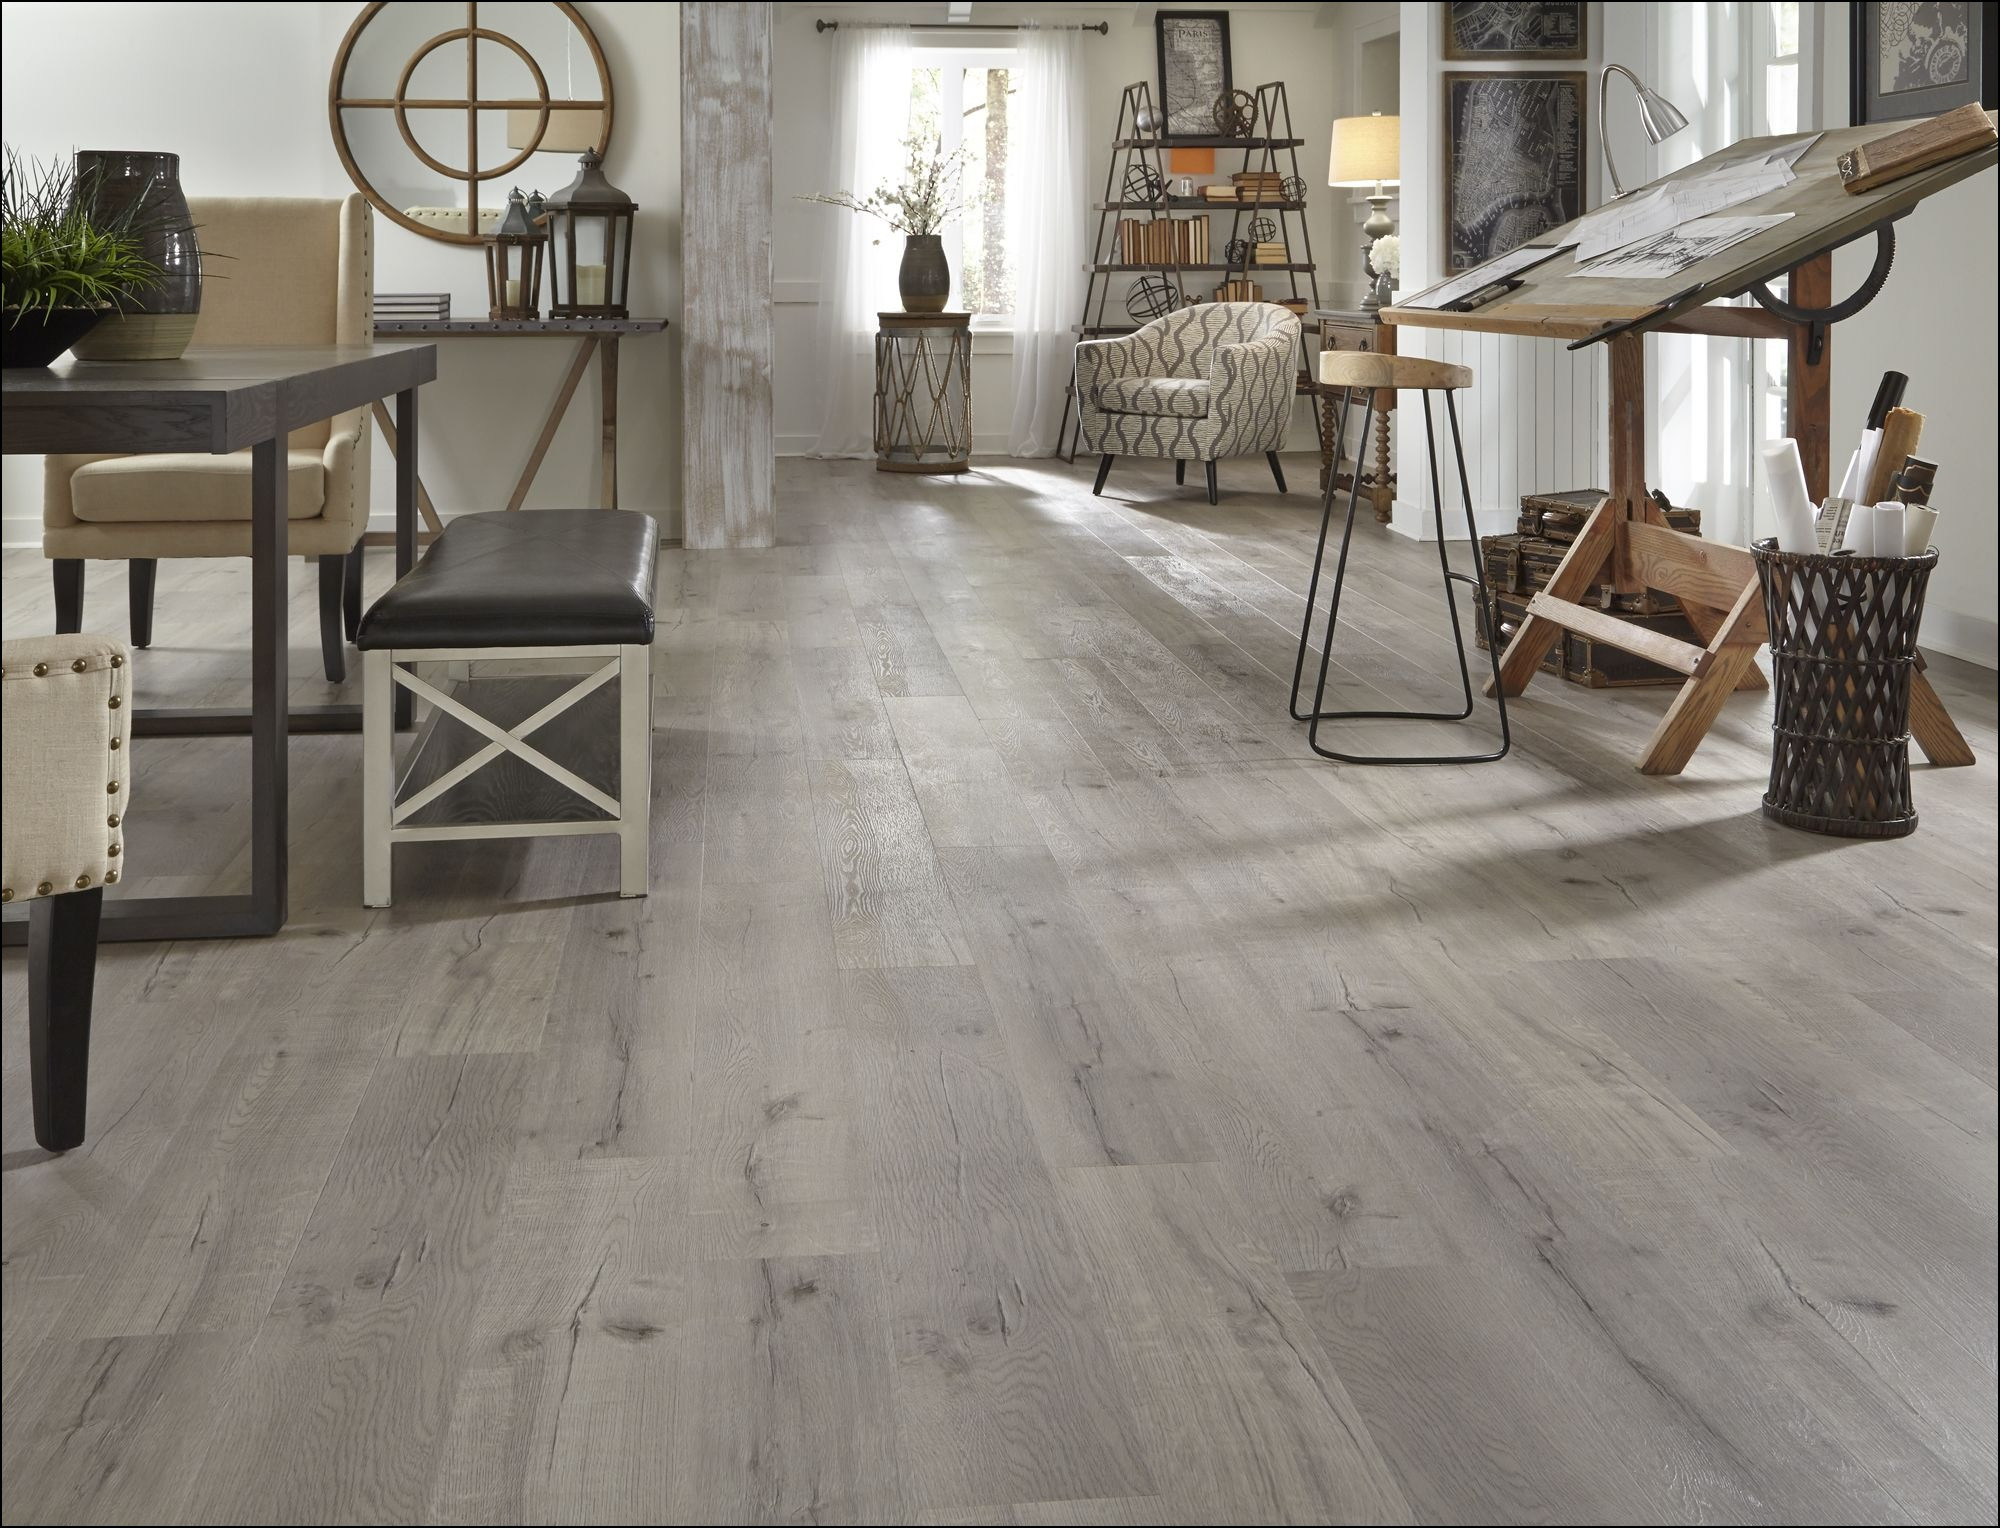 grey hardwood floors toronto of hardwood flooring suppliers france flooring ideas within hardwood flooring pictures in homes collection this fall flooring season see 100 new flooring styles like